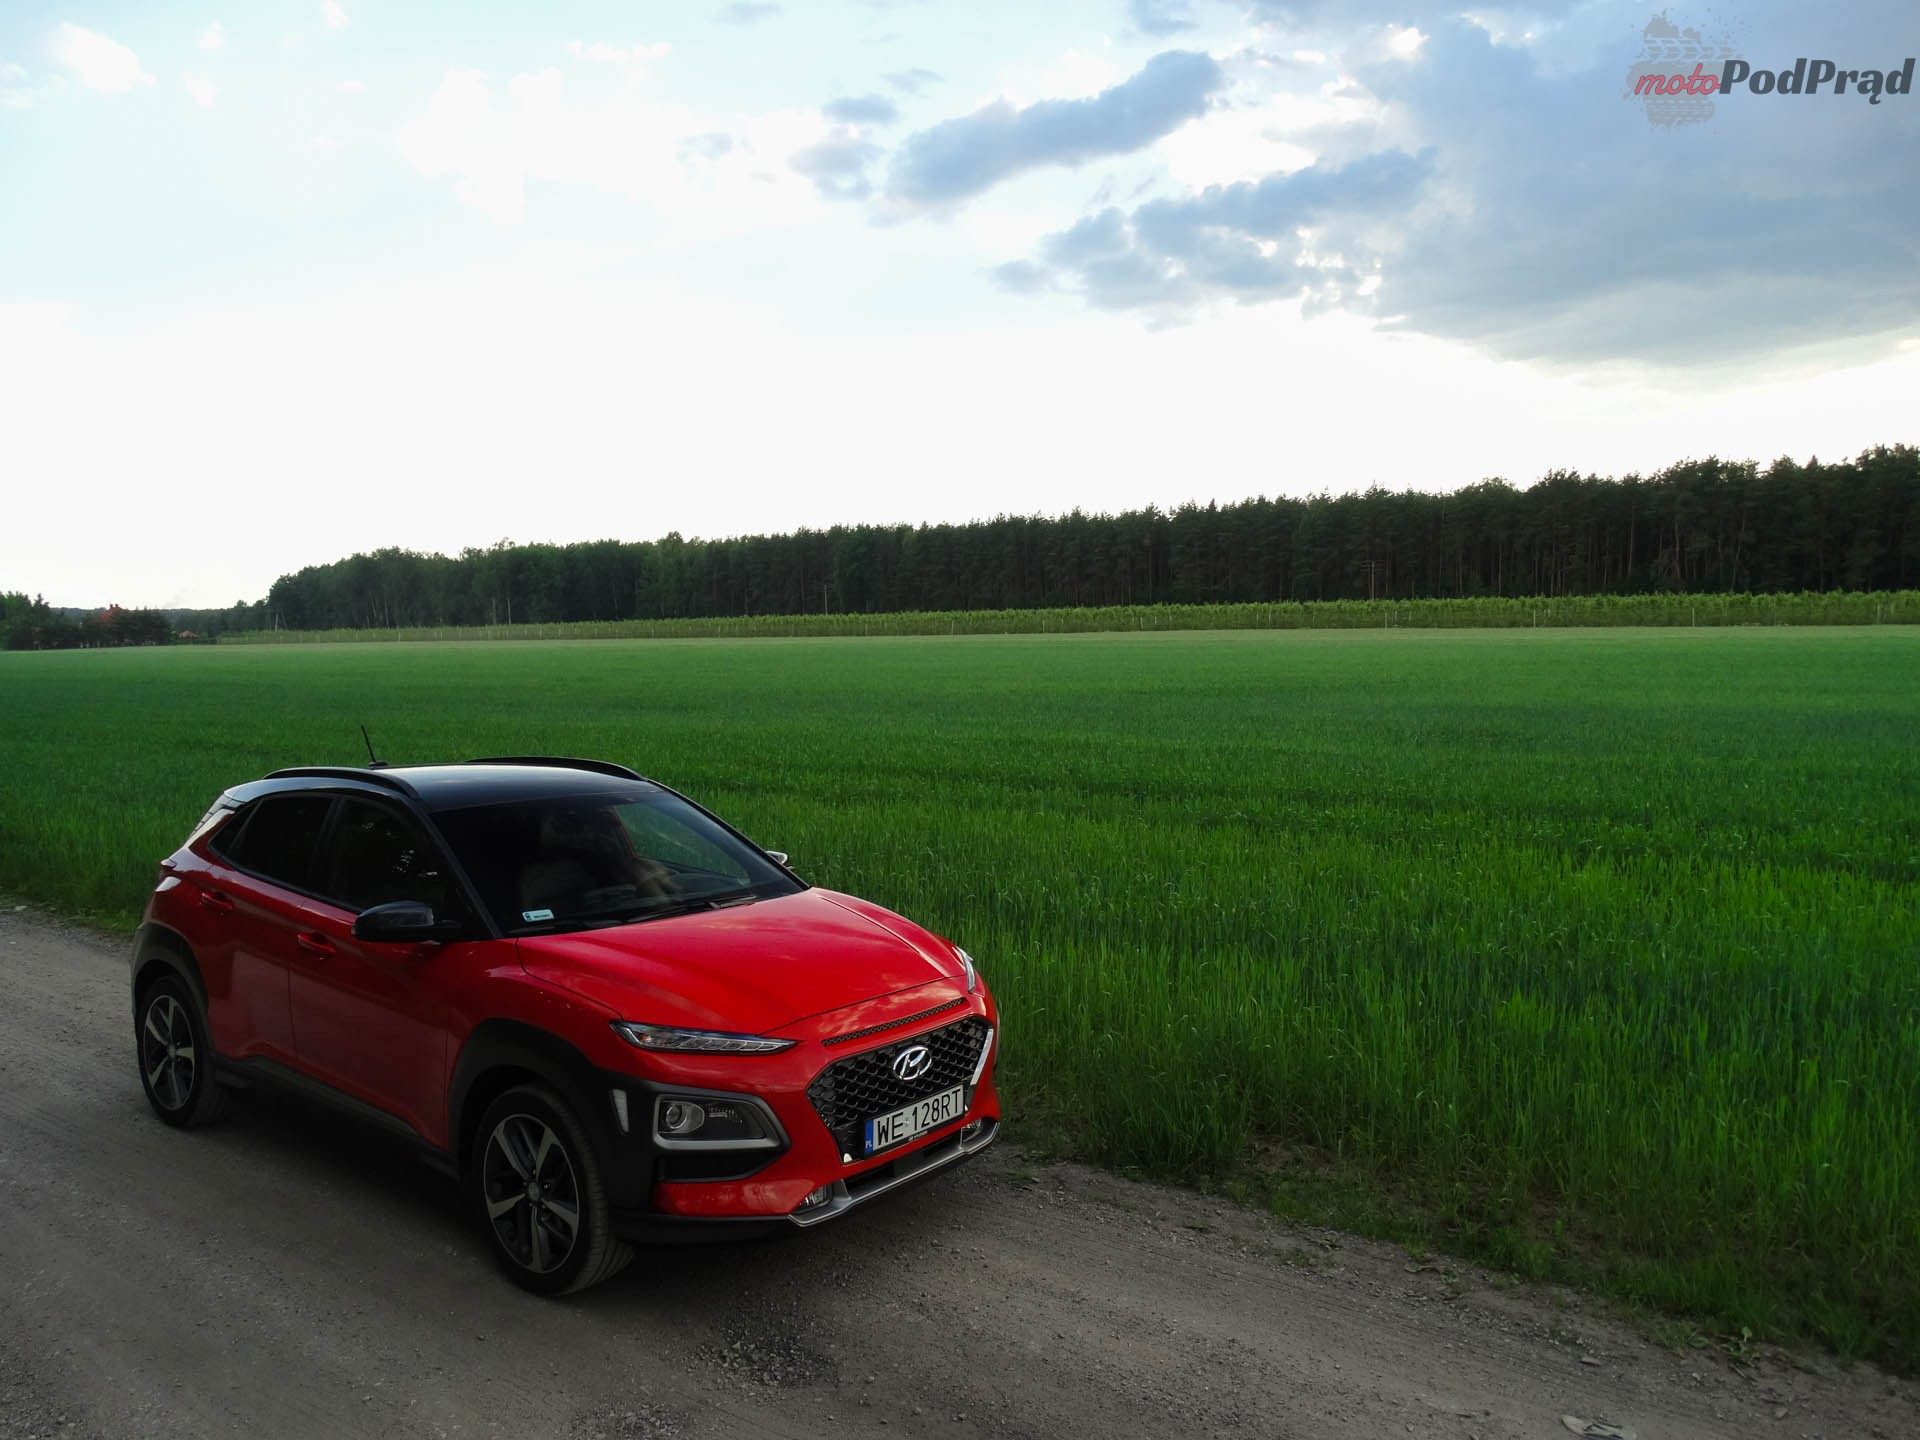 Hyundai Kona 7 Porównanie: Hyundai Kona 1.0 kontra Seat Arona 1.0